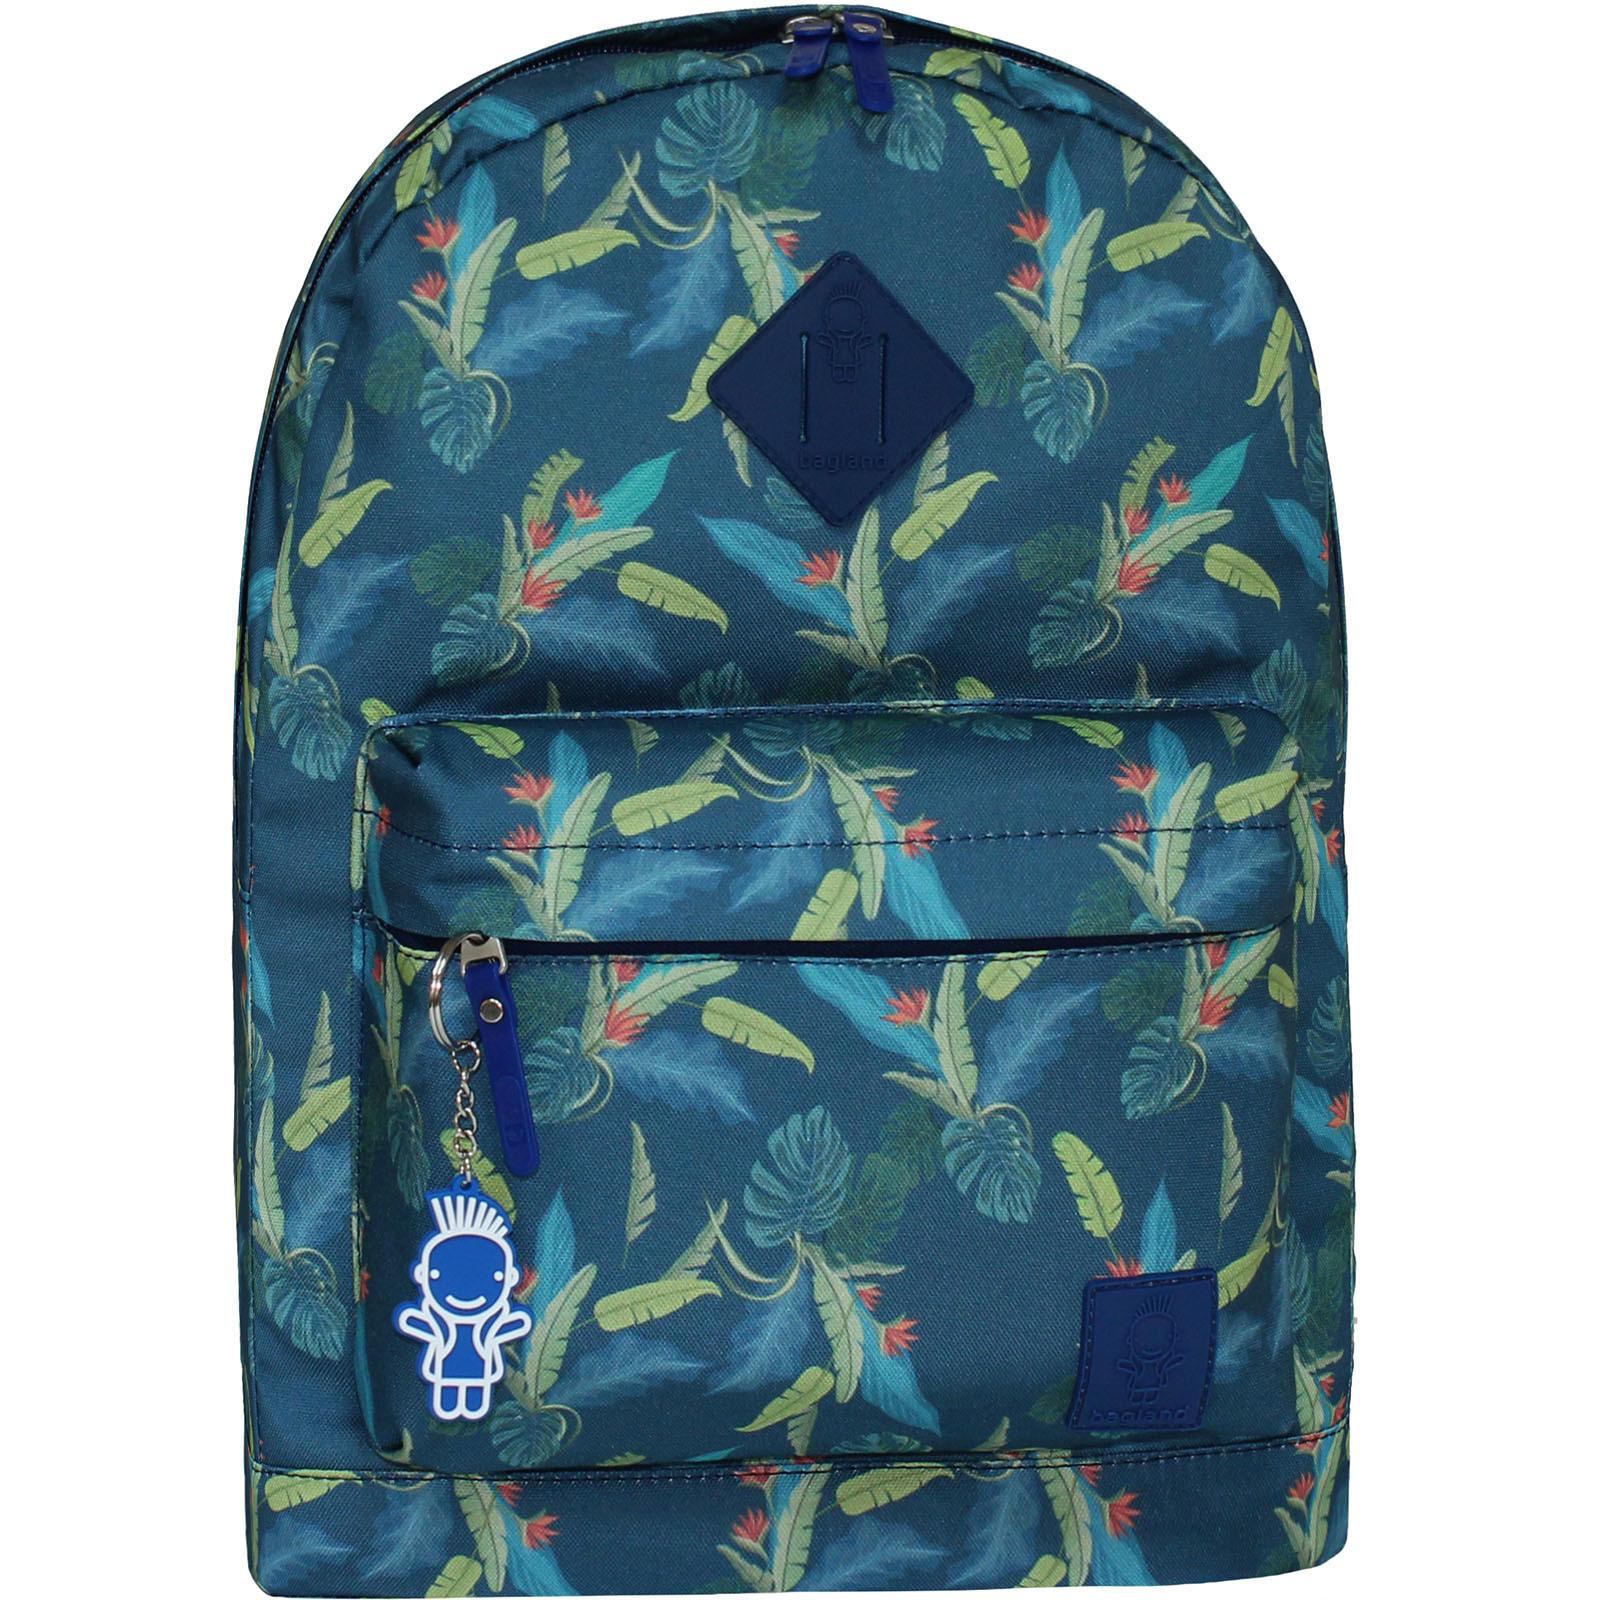 Городские рюкзаки Рюкзак Bagland Молодежный (дизайн) 17 л. сублимация 359 (00533664) IMG_7139_359.JPG